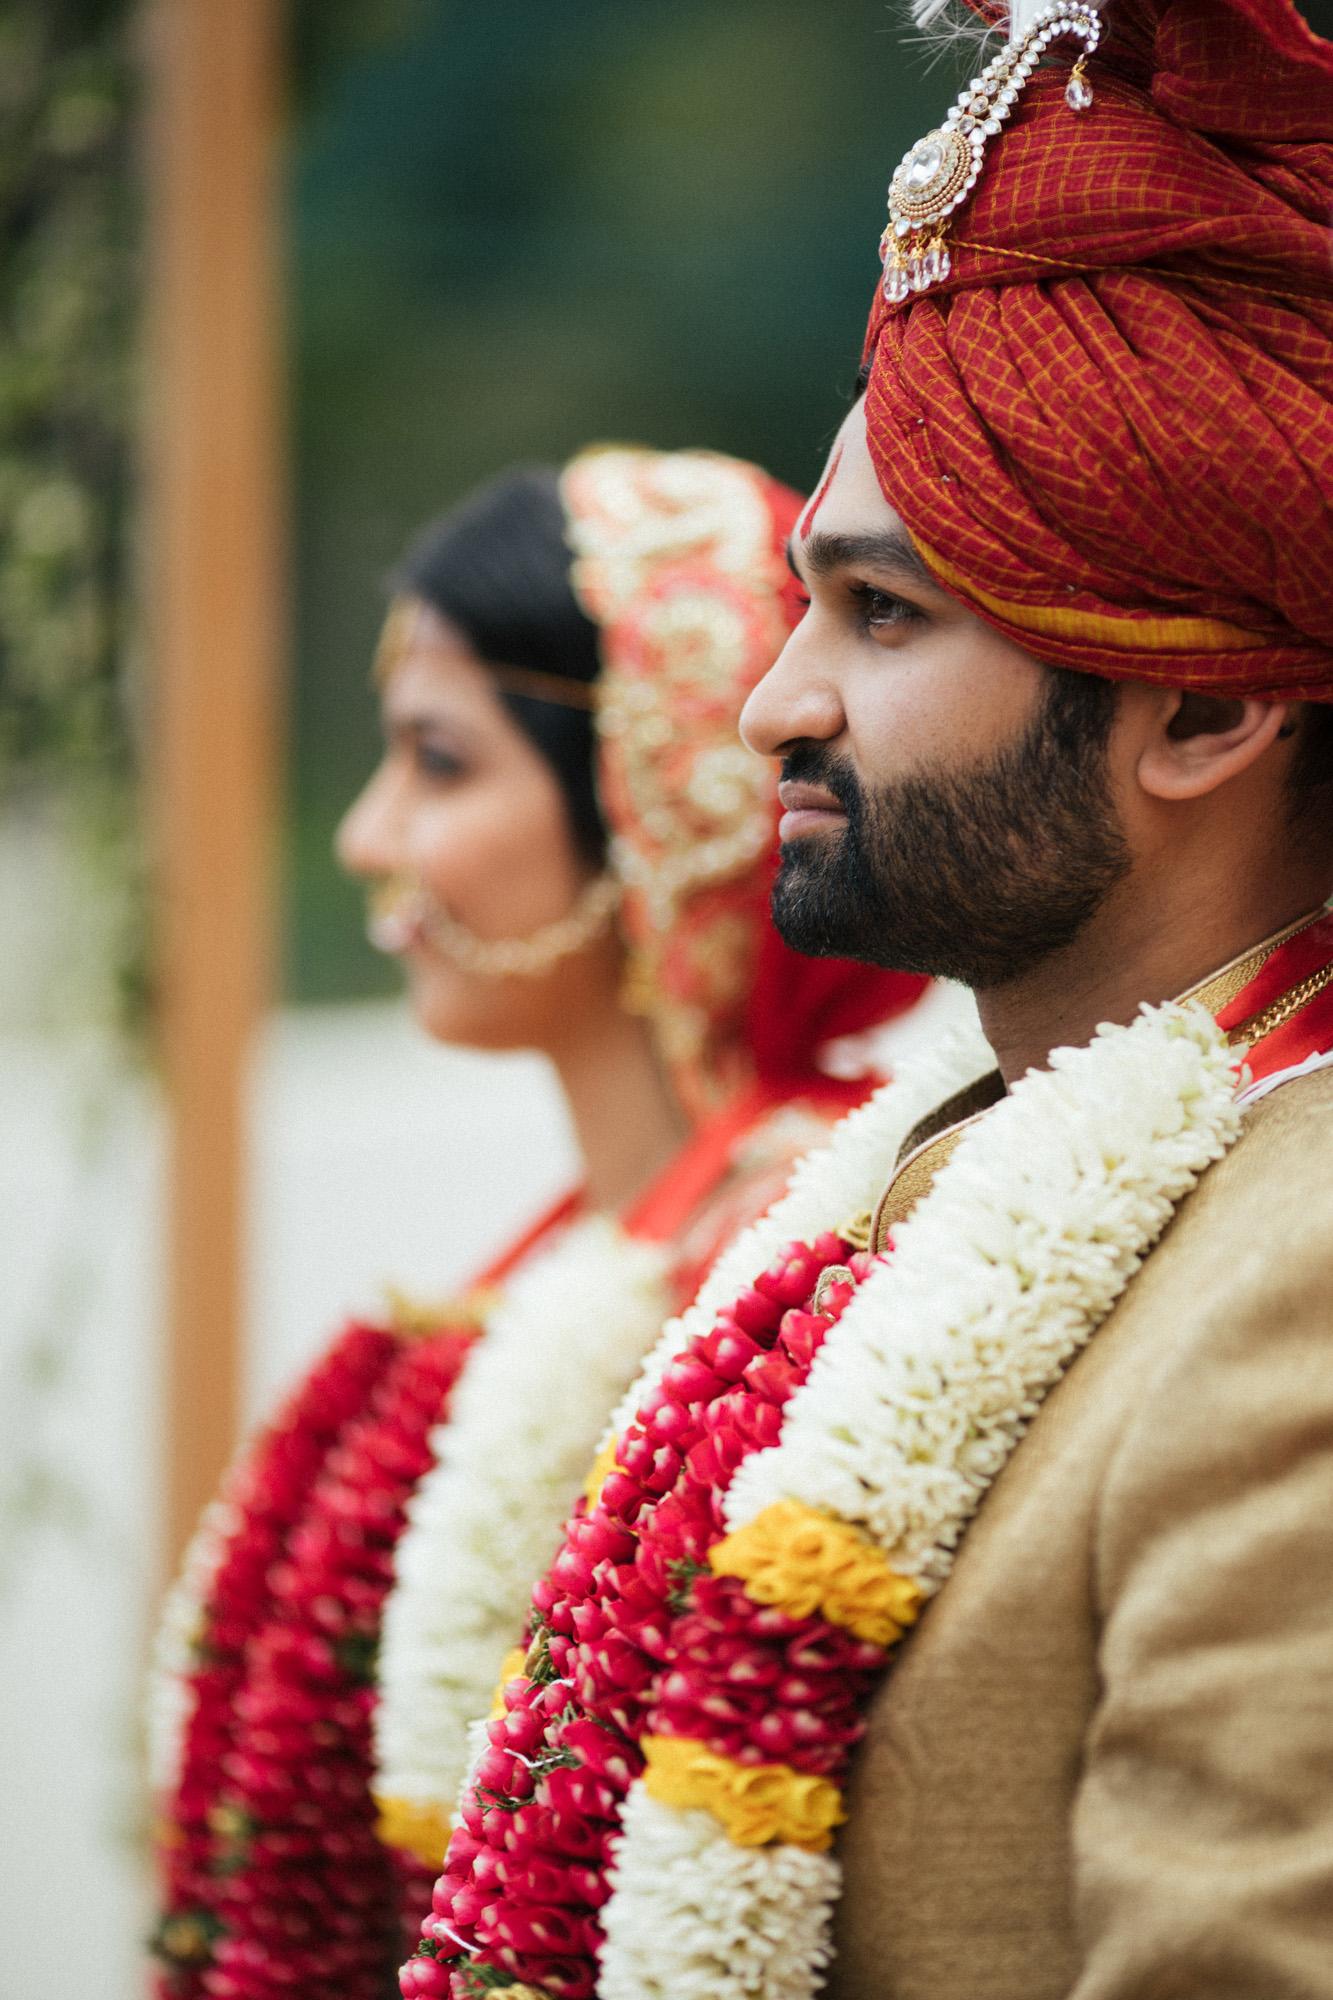 anu_maneesh_alec_vanderboom_Indian_wedding_photography-0106.jpg